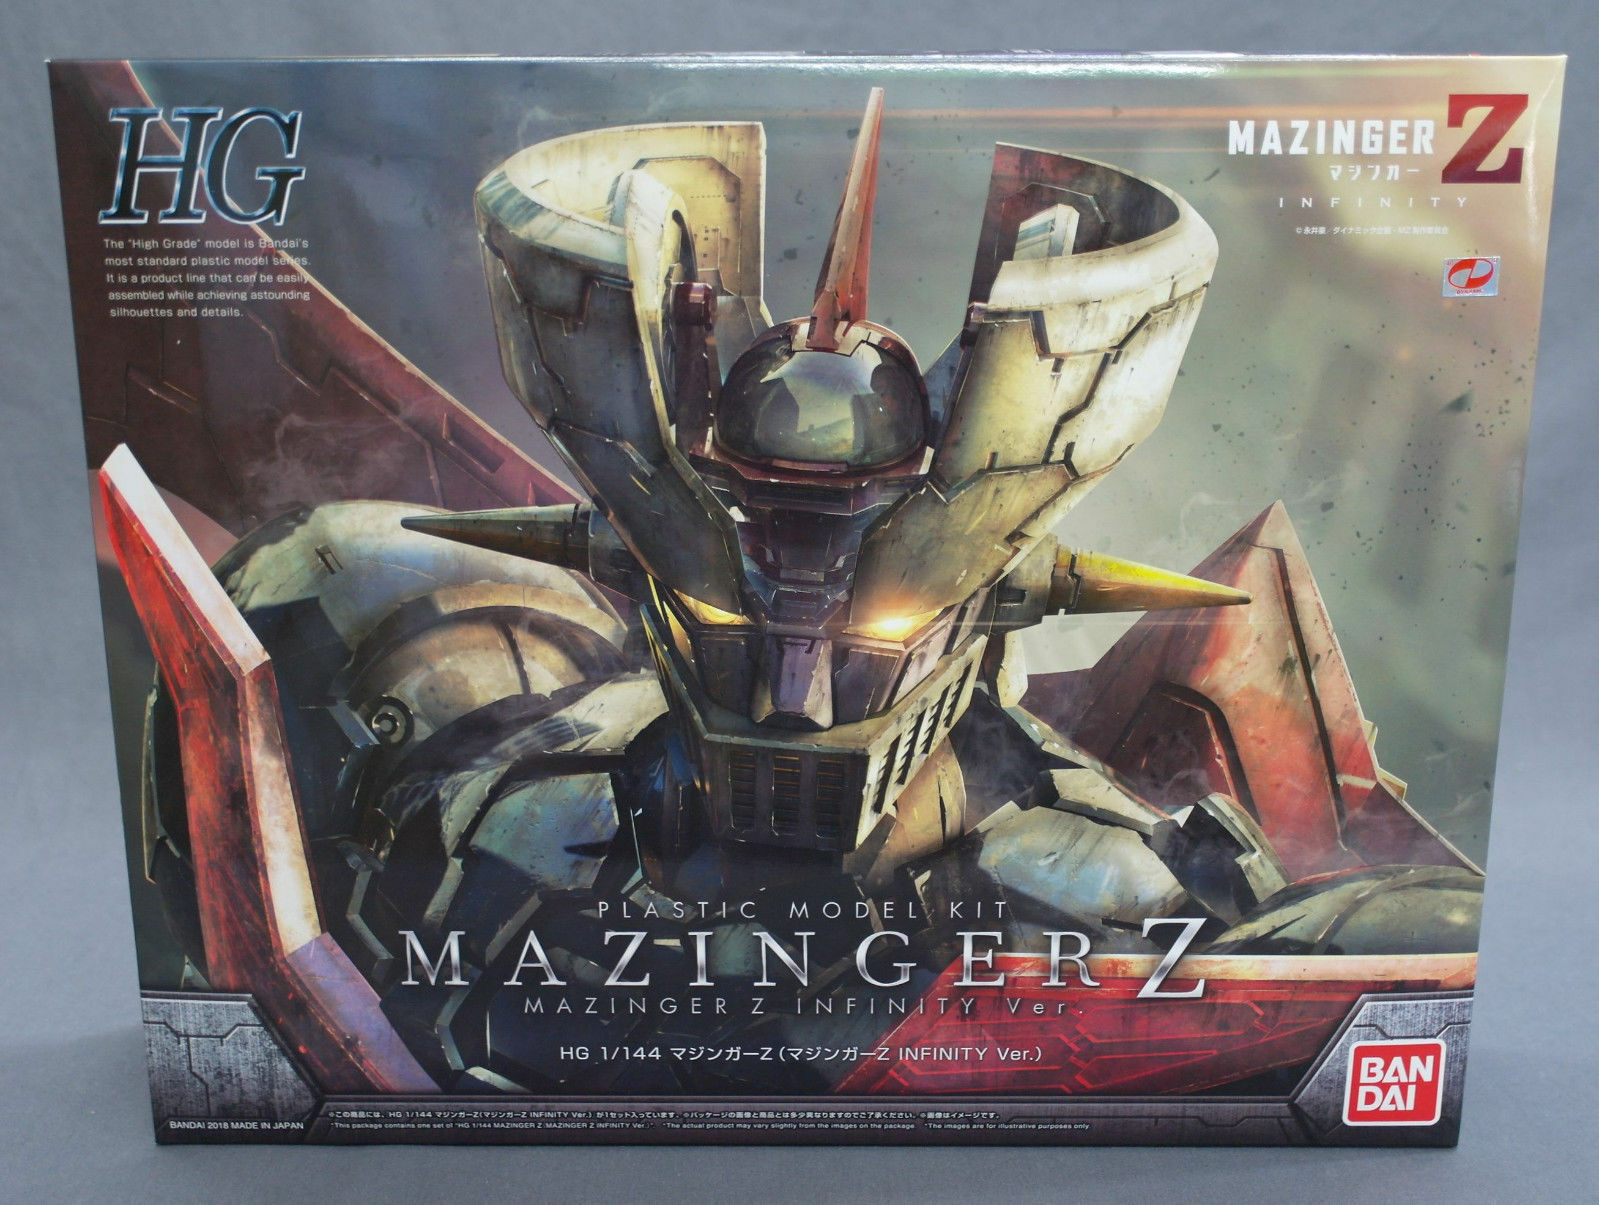 Mazinger Z HG Mazinger Z INFINITY Ver. 1/144 Plastic Model Kit Bandai NEW